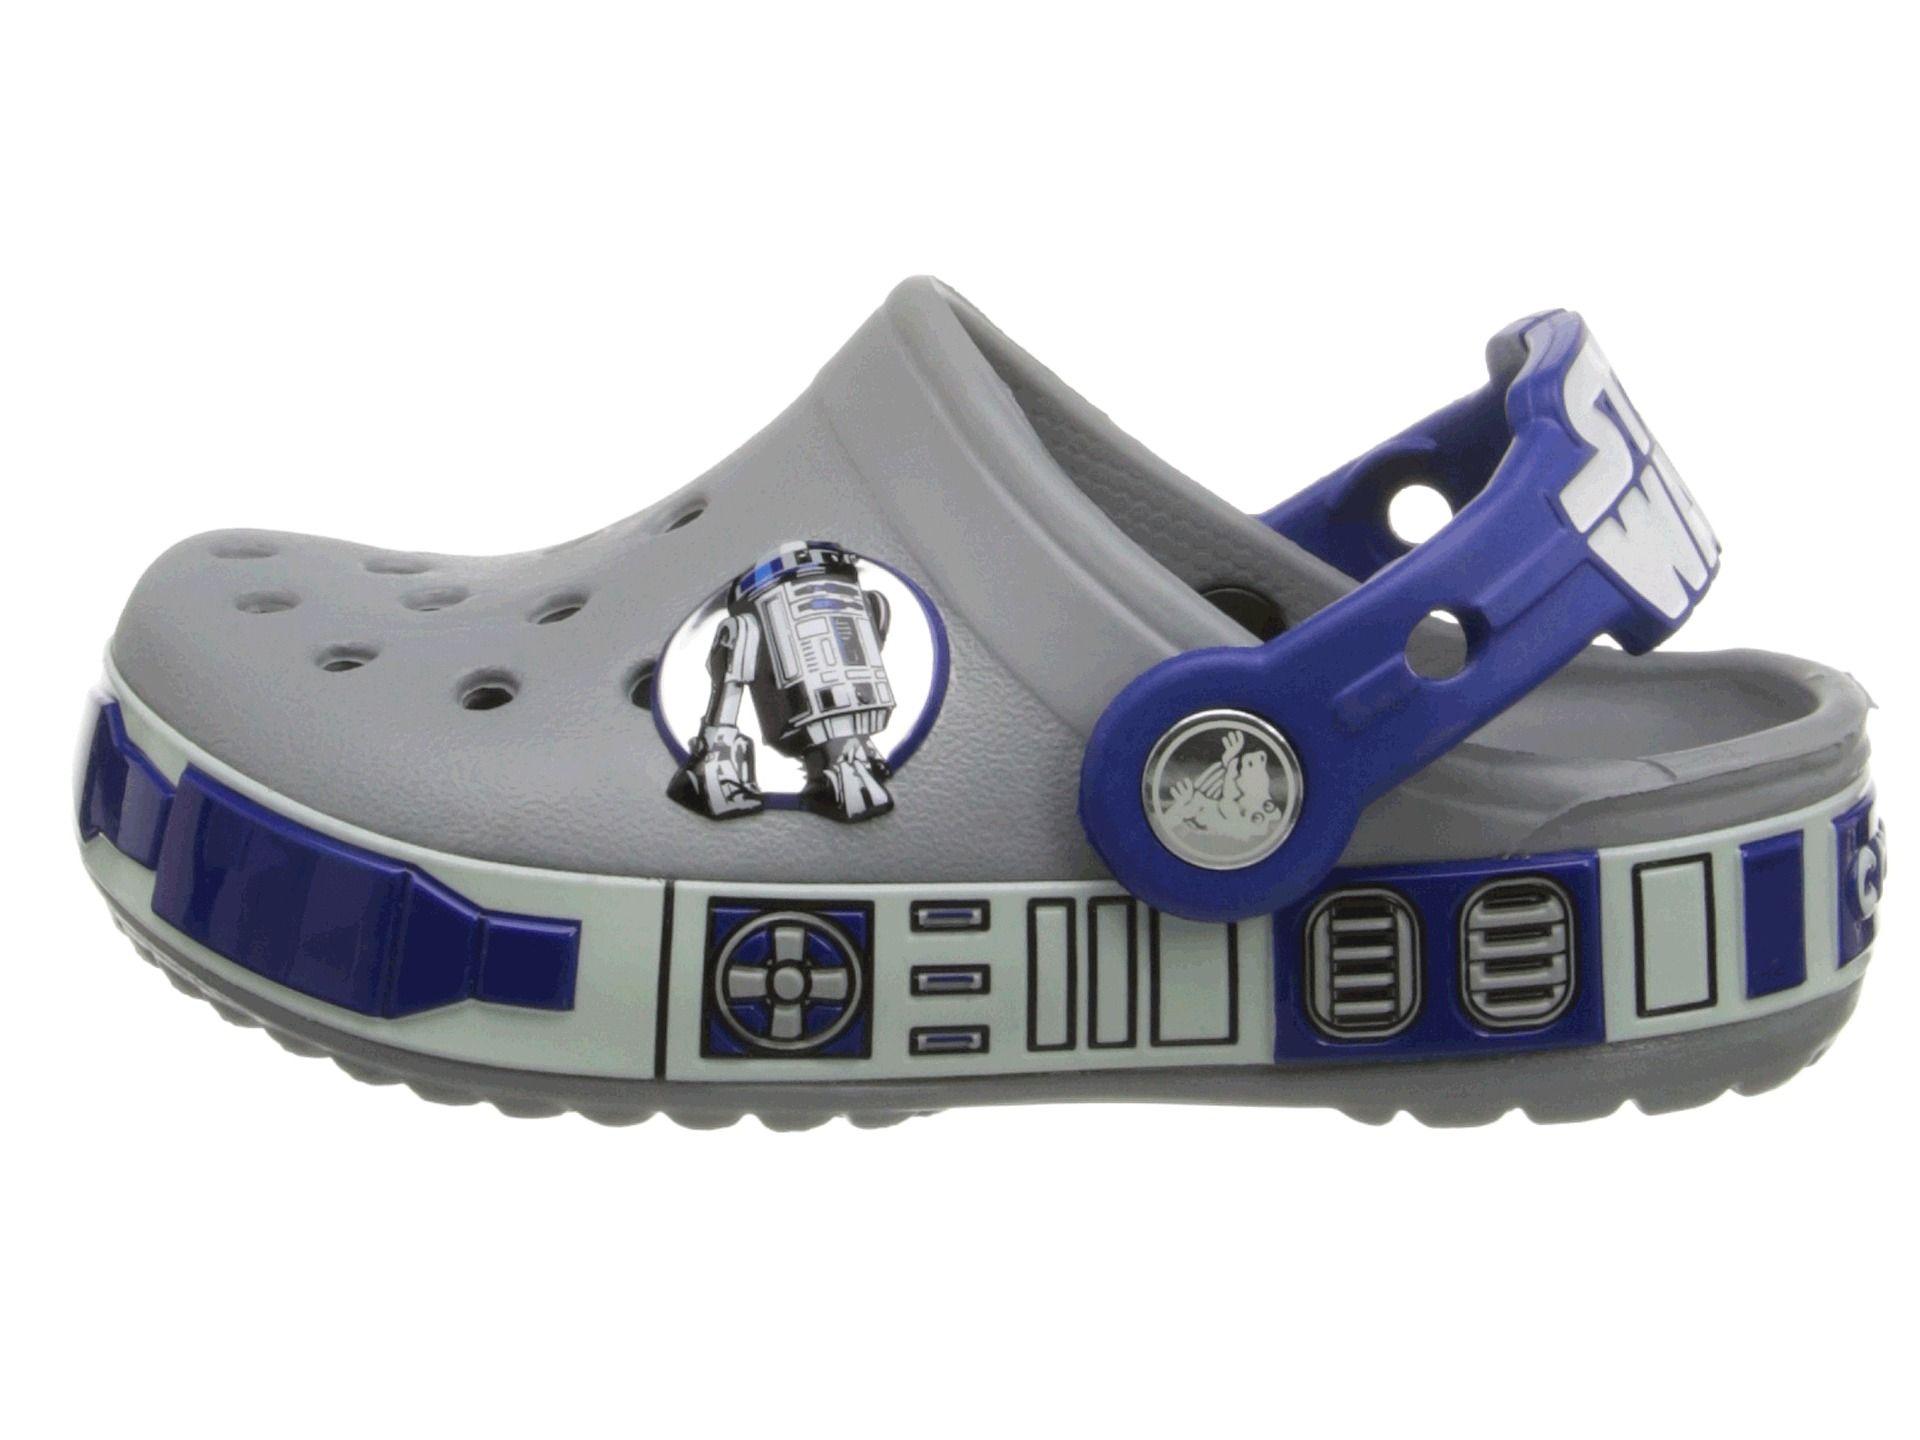 Sabots Crocs Star Wars R2D2 Kids - Crocs 75xXobZAJy